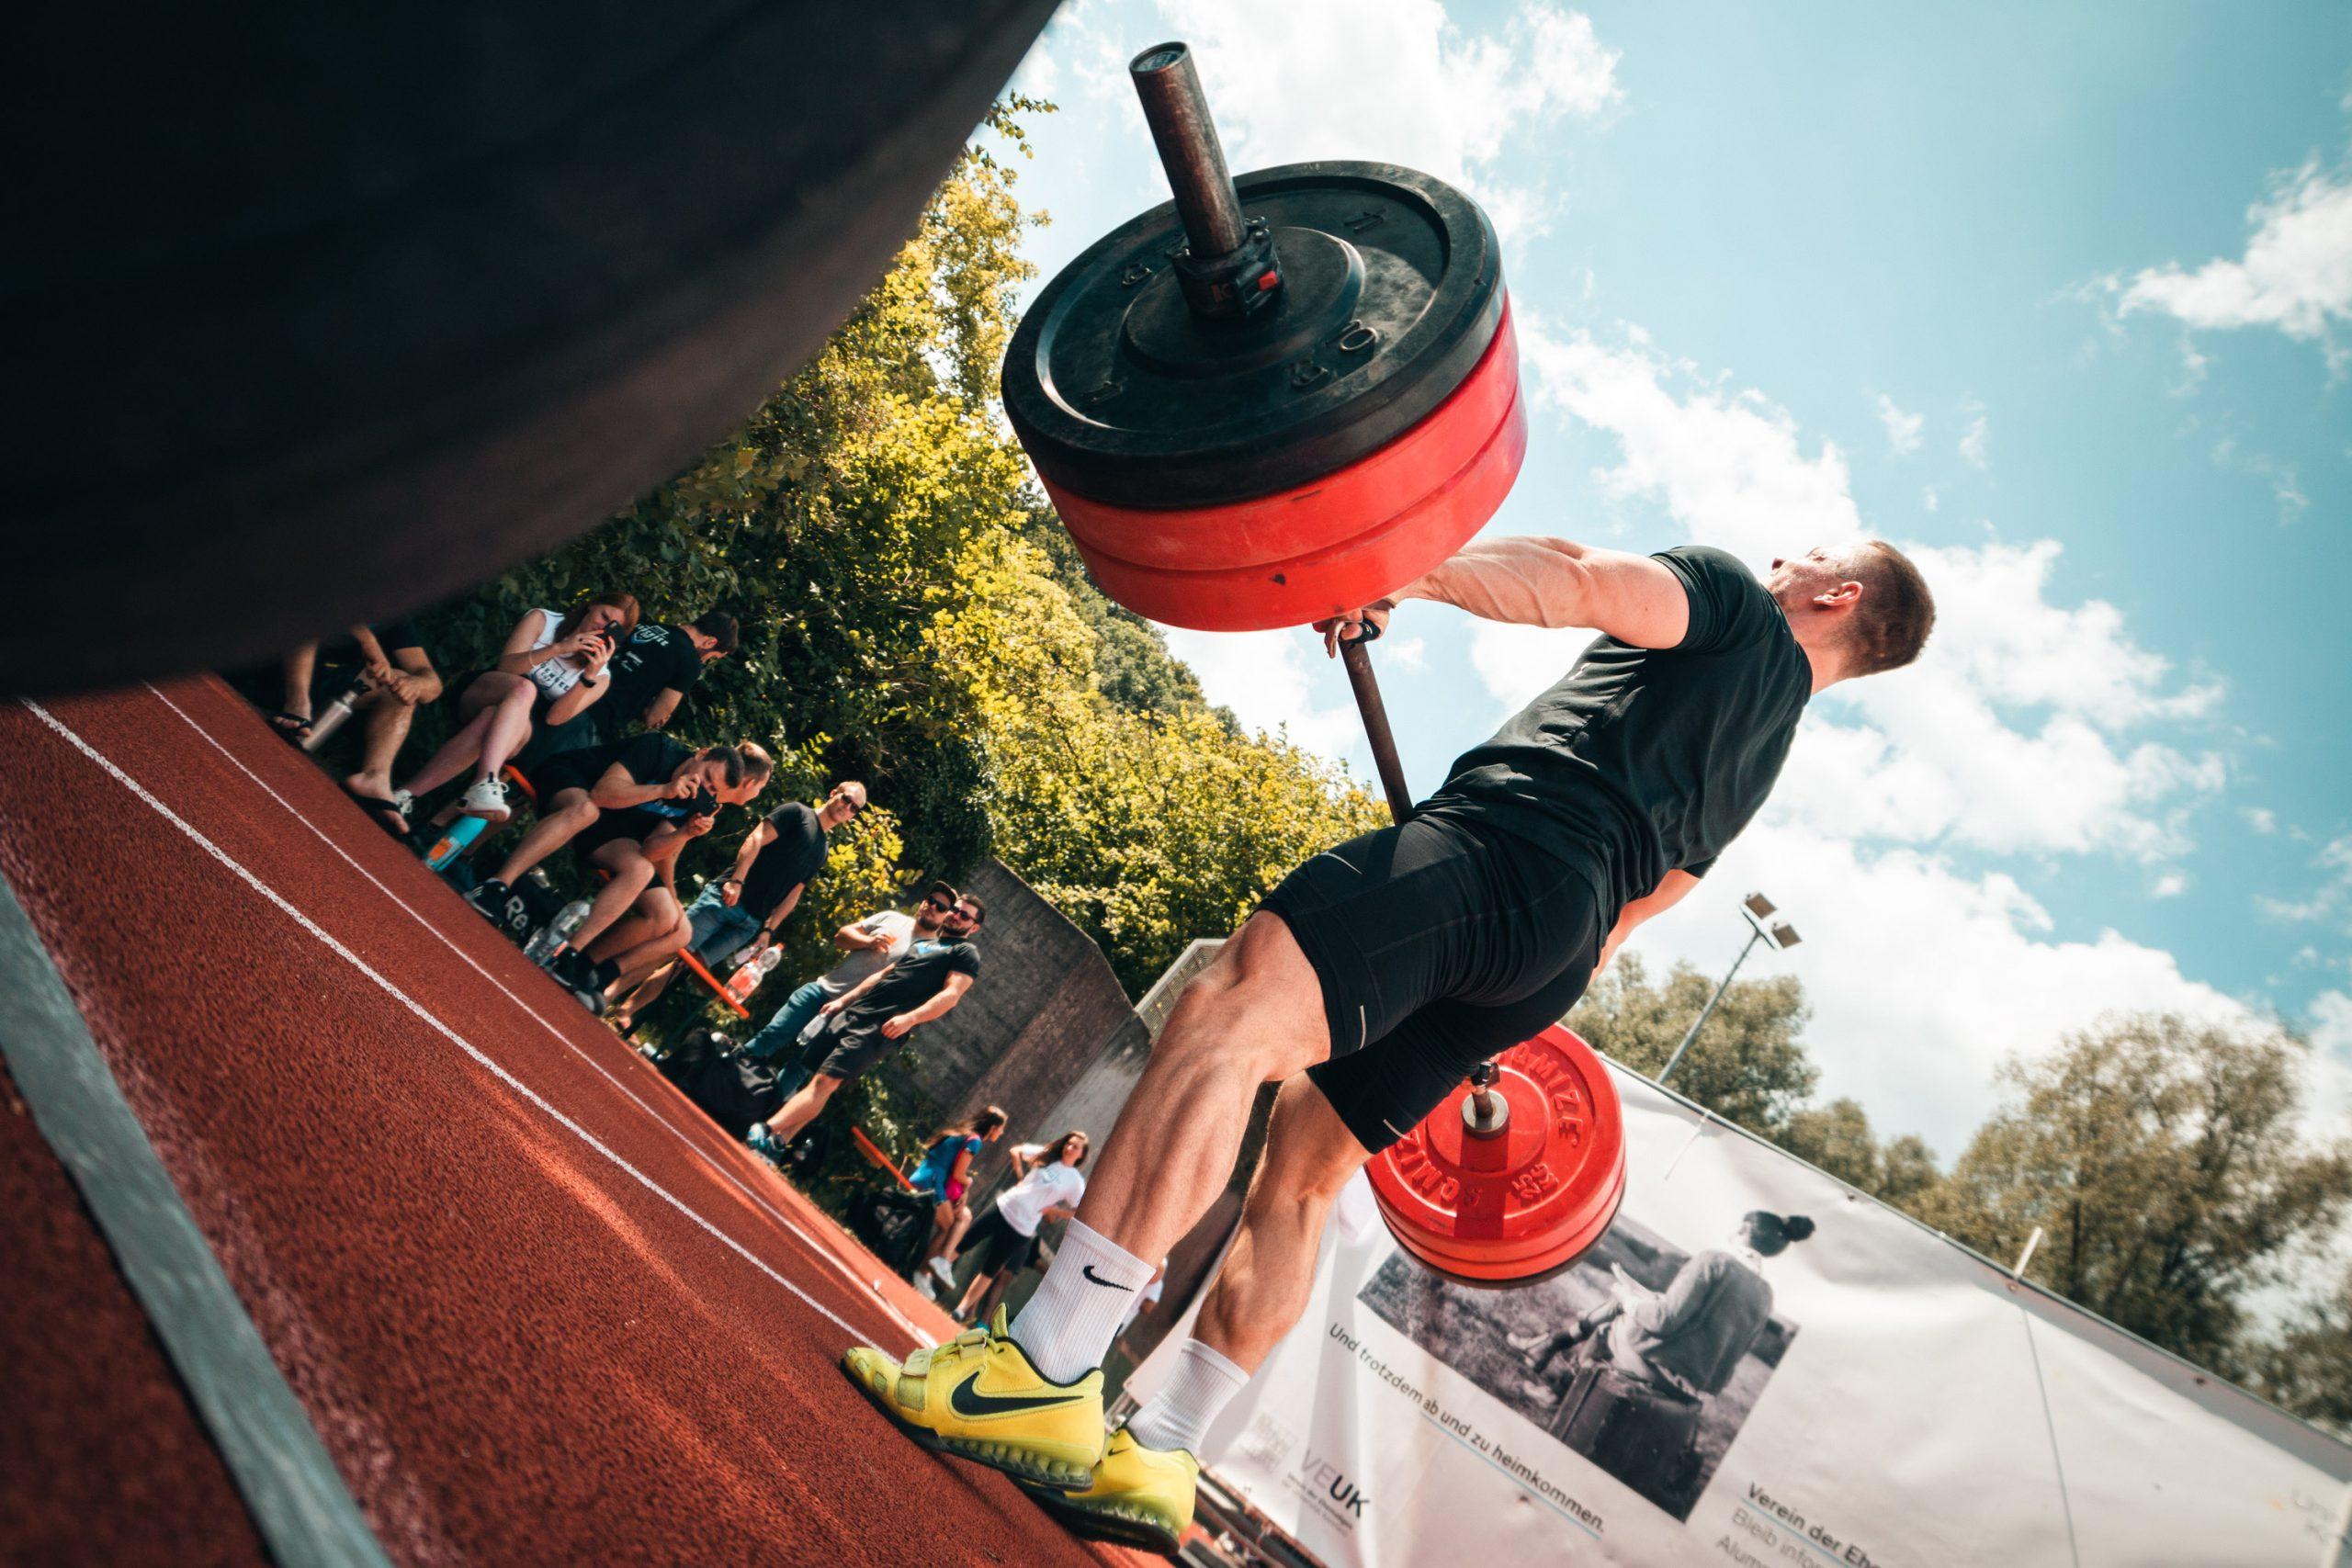 Outdoor Gewichtheben Konstanz